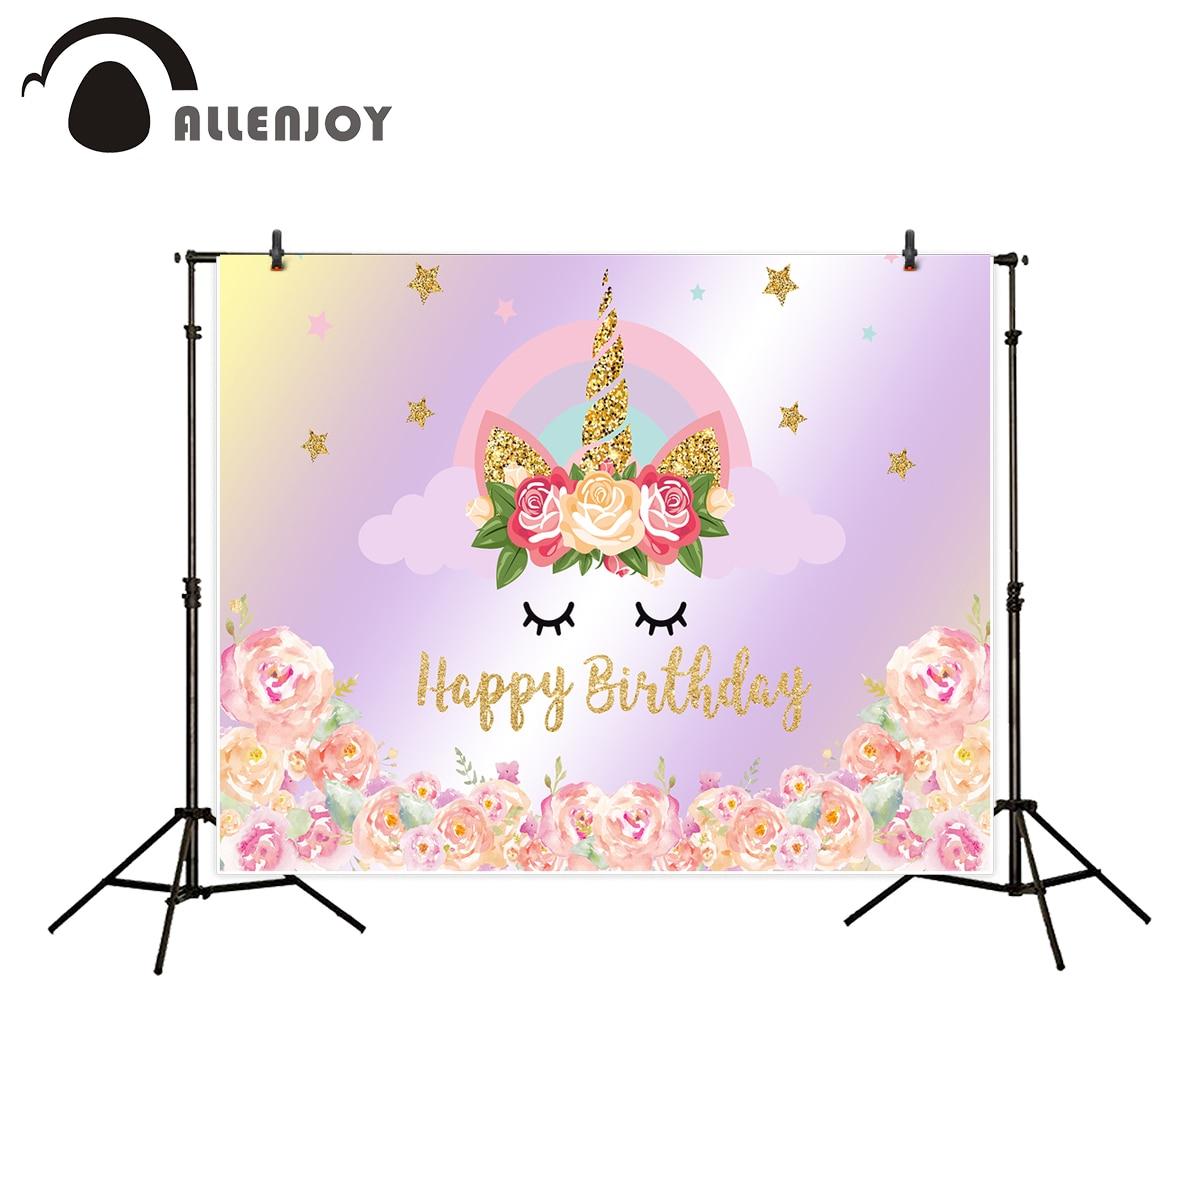 Allenjoy backdrop for photographic studio Golden Pink Stars Rainbow Unicorn Flower Happy Birthday background new photocall